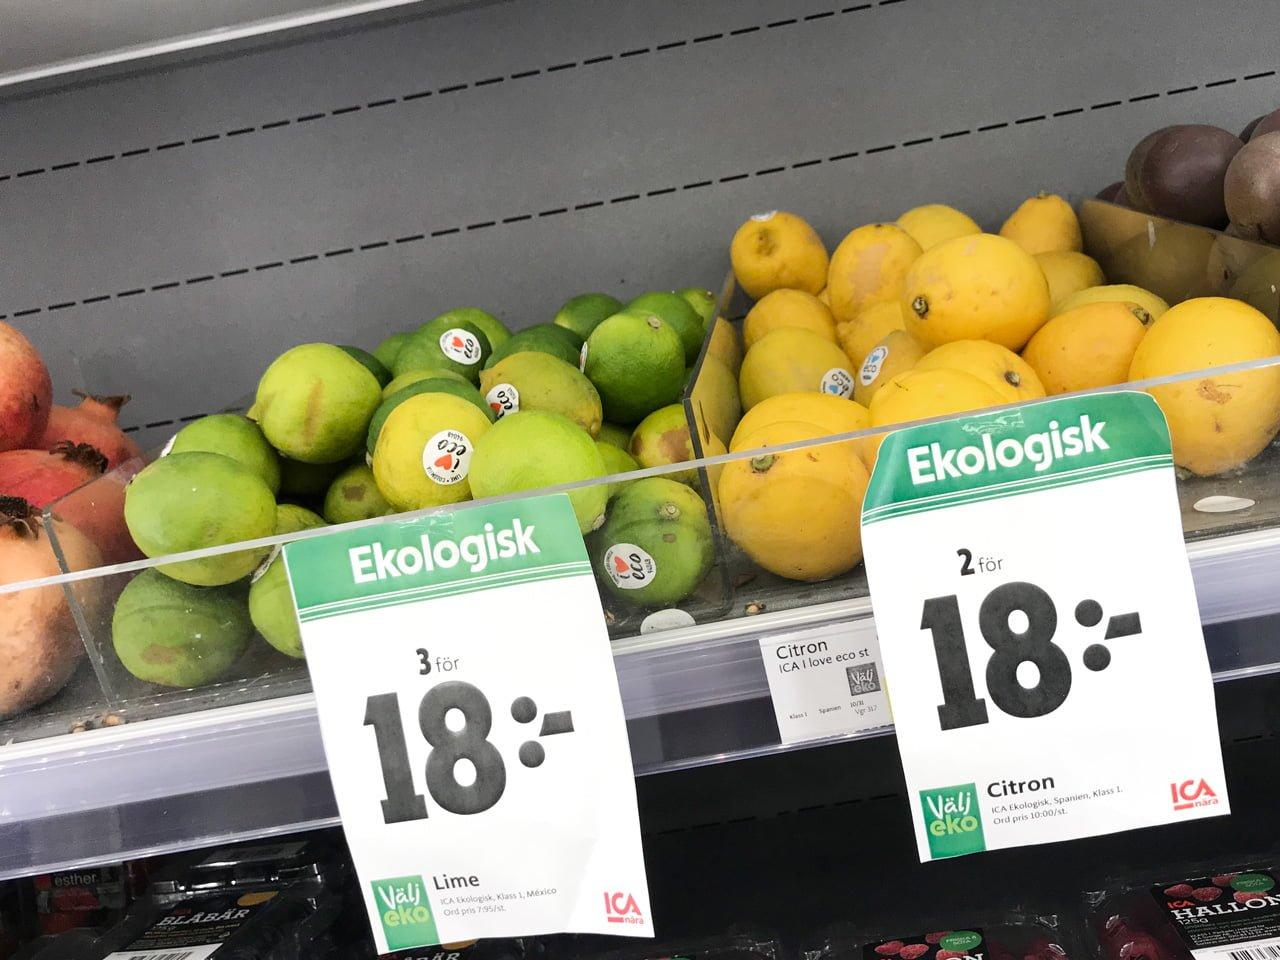 ekologisk lime citron